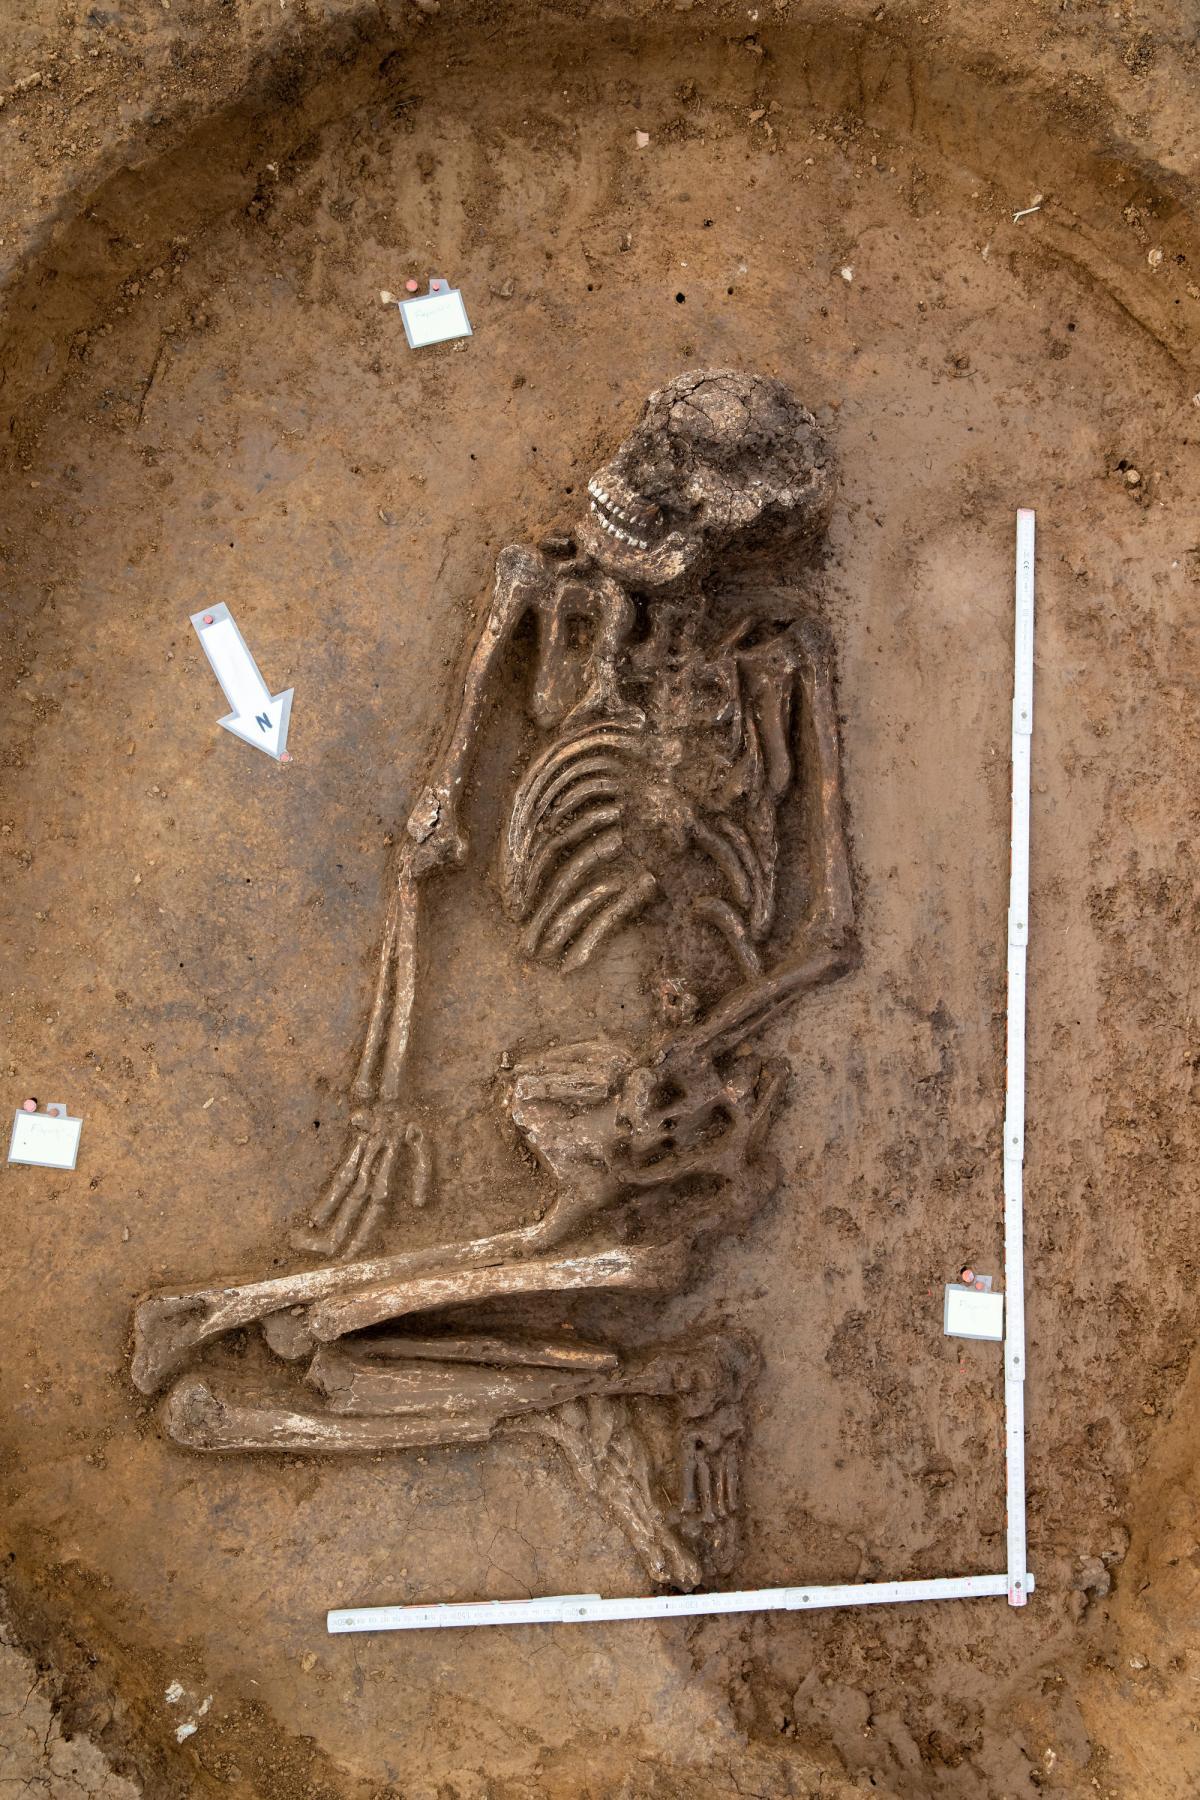 6500-year-old skeleton found in Bavarian cornfield